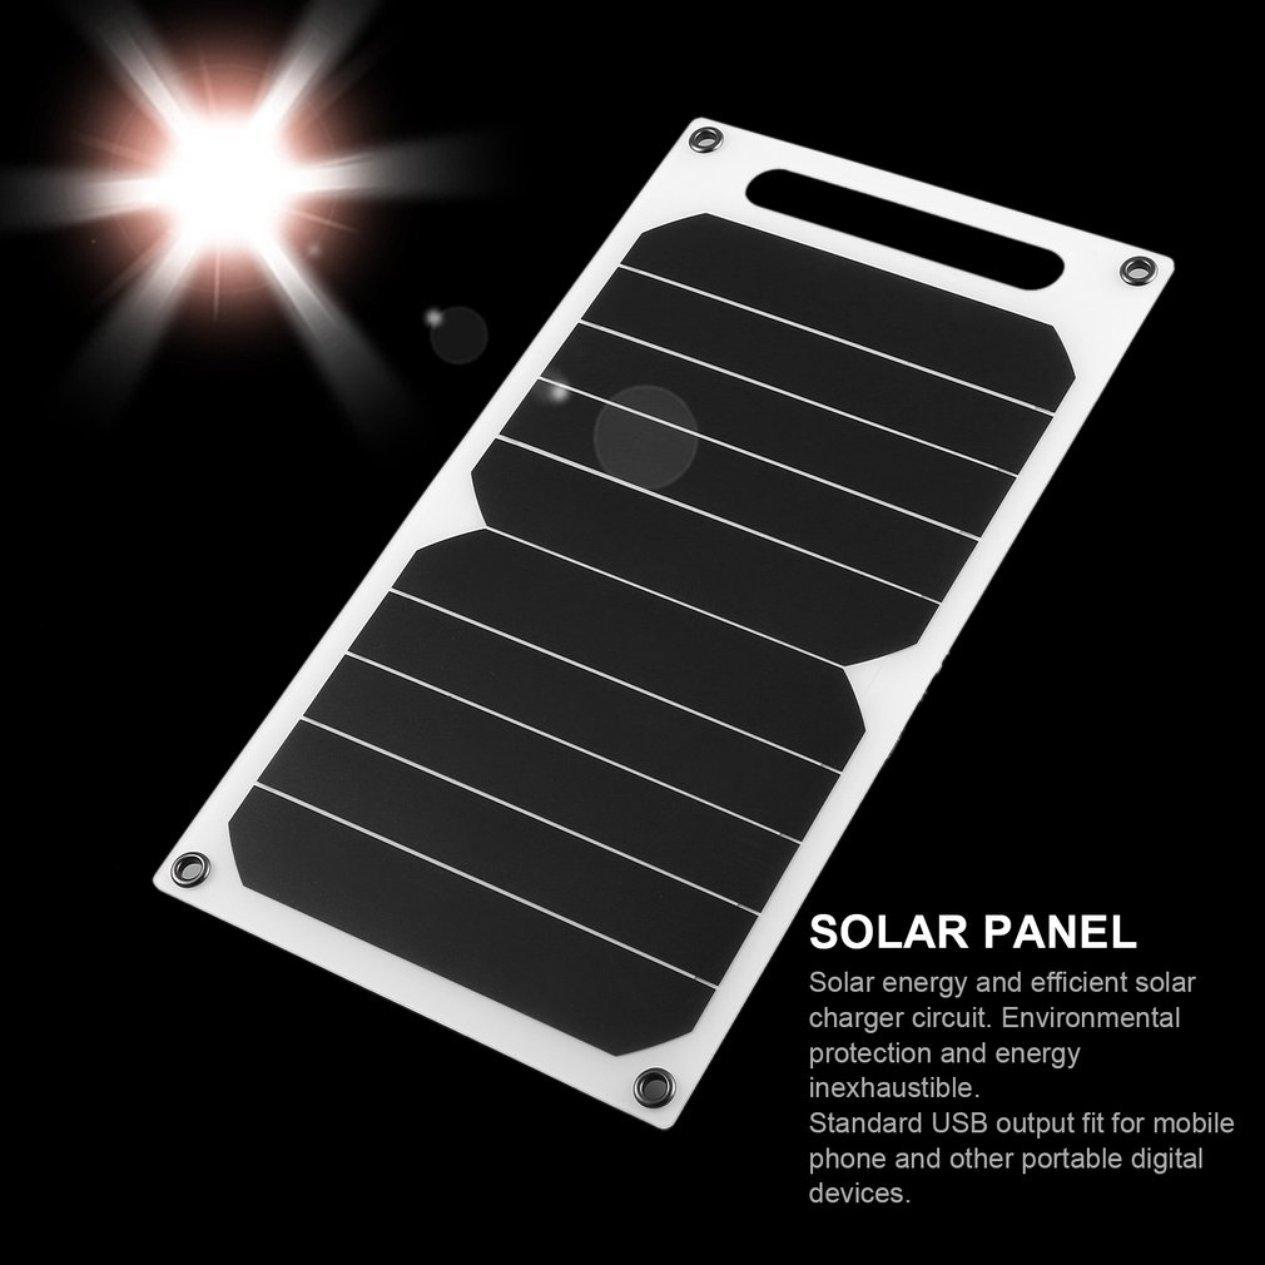 5v 5w Portable Solar Lade Panel Leichte Power Usb Mobile Charger The Circuit Elektronik